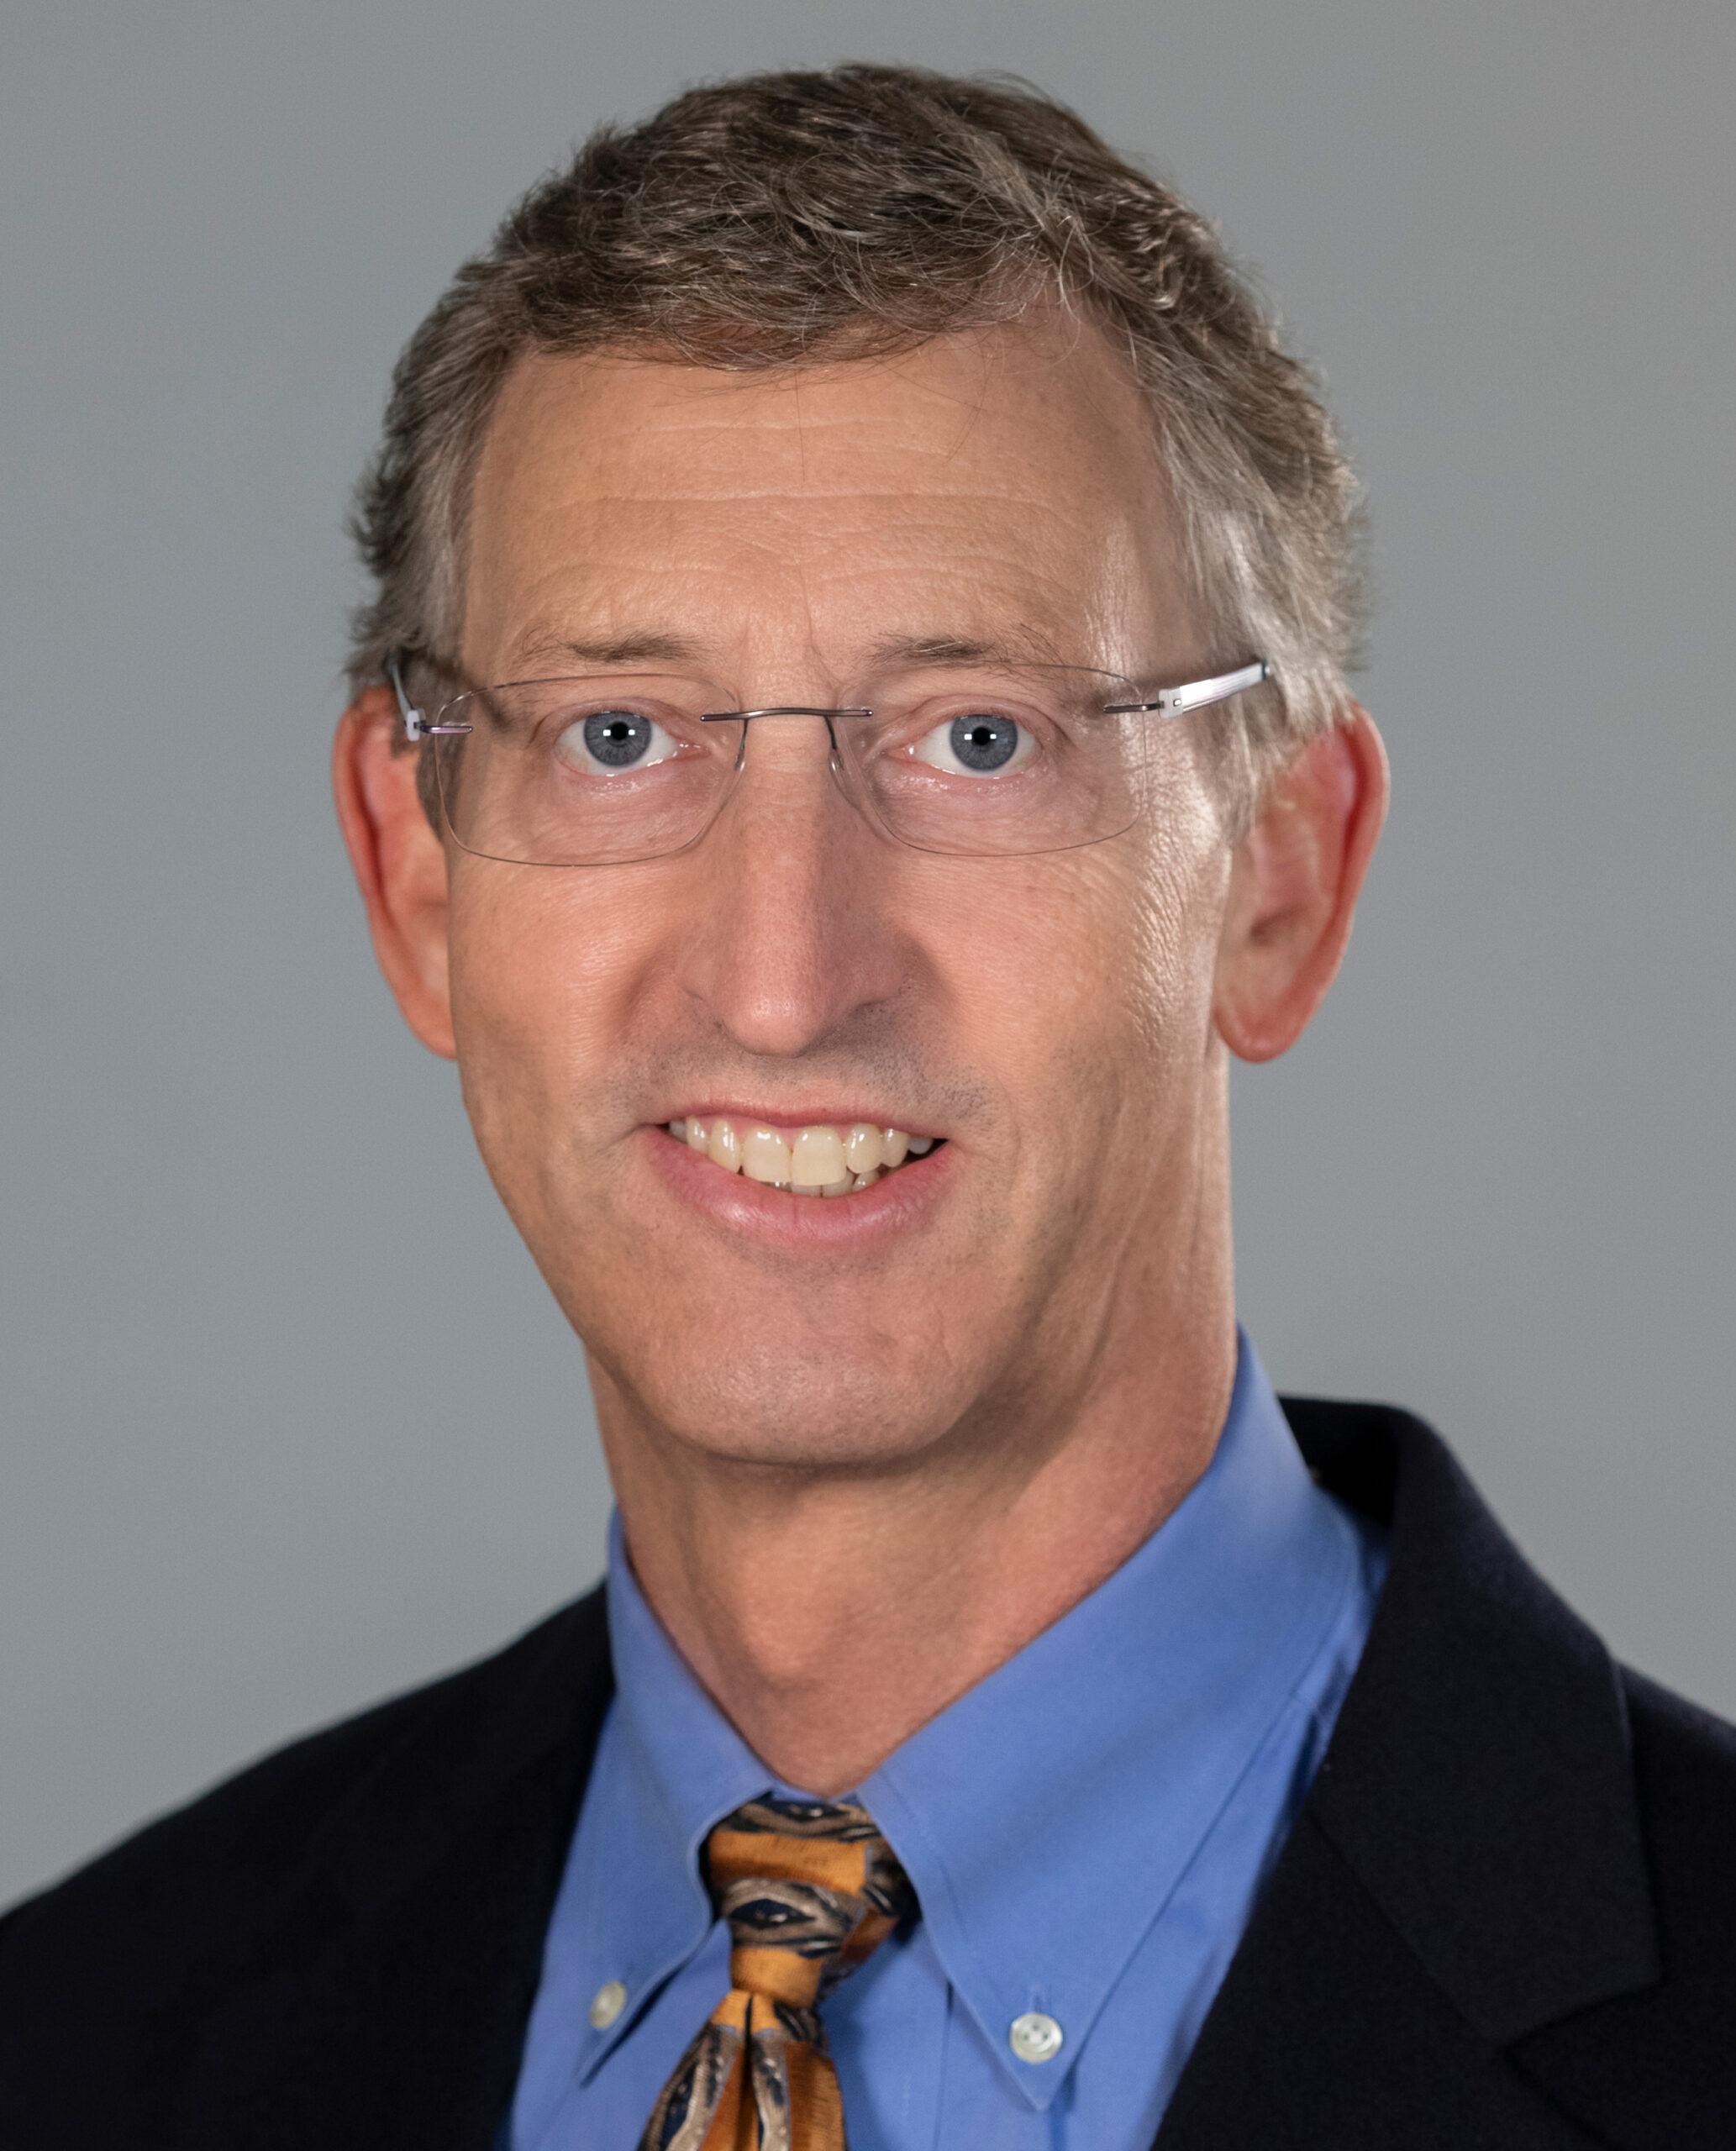 Douglas Blankenship Headshot Crop